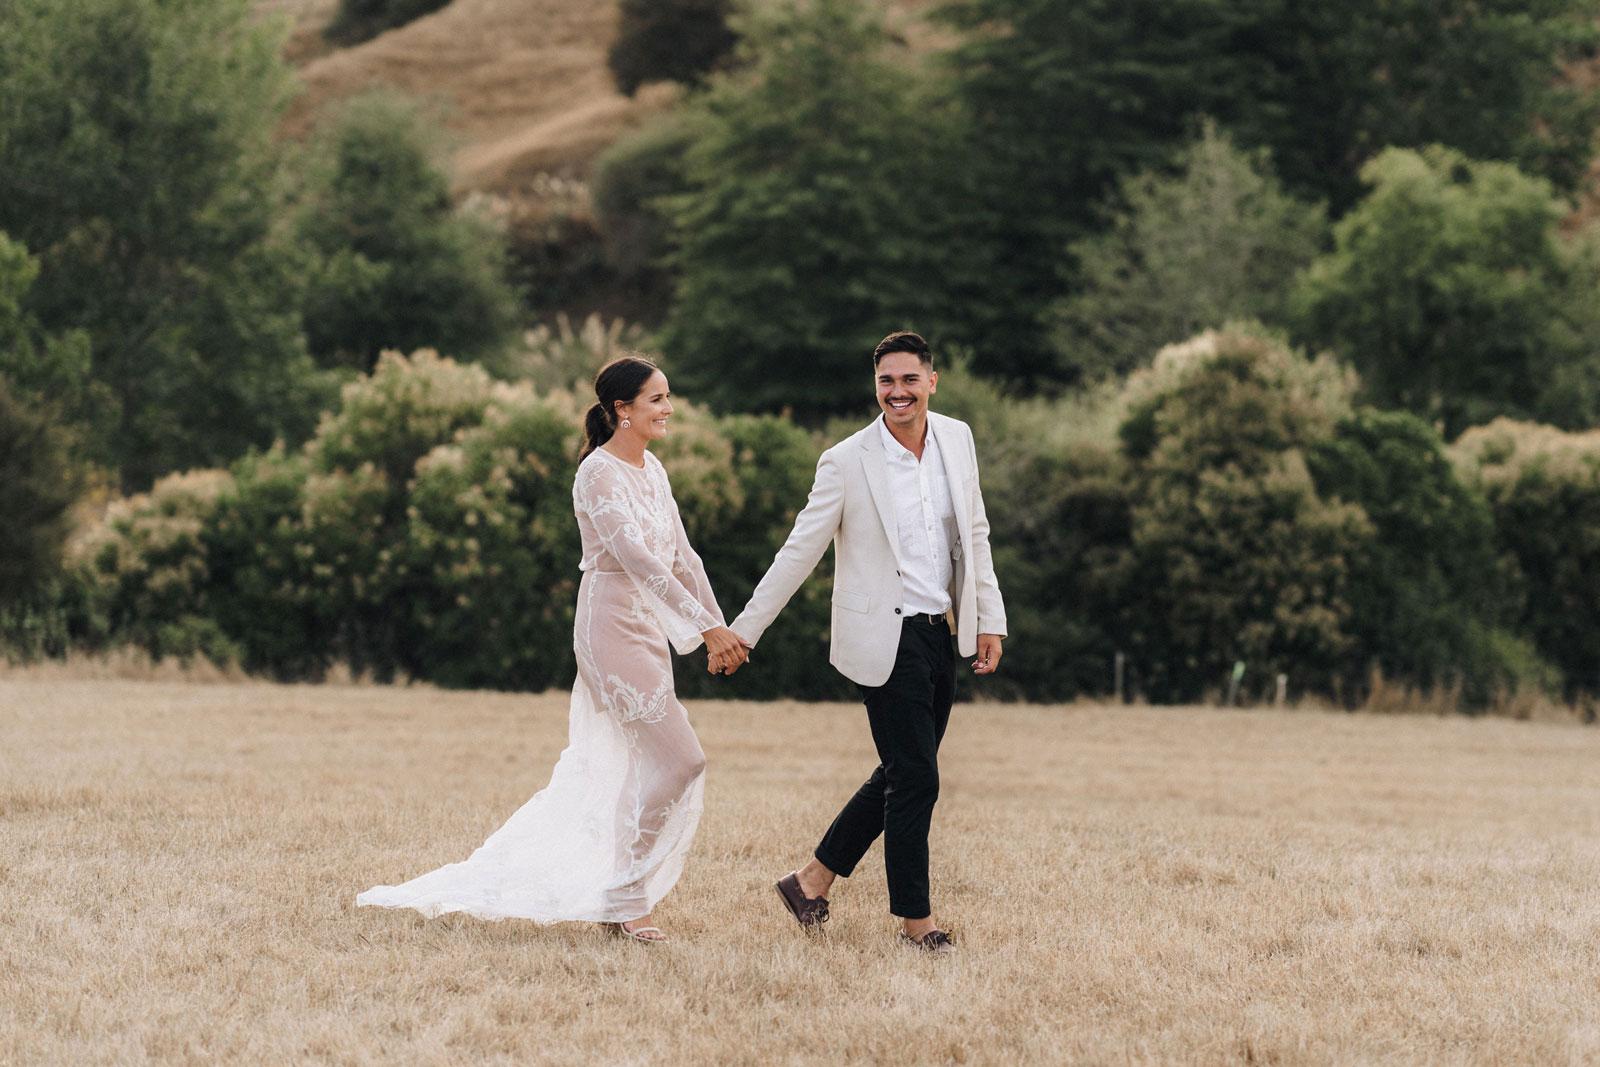 newfound-s-t-hunua-auckland-wedding-photographers-105